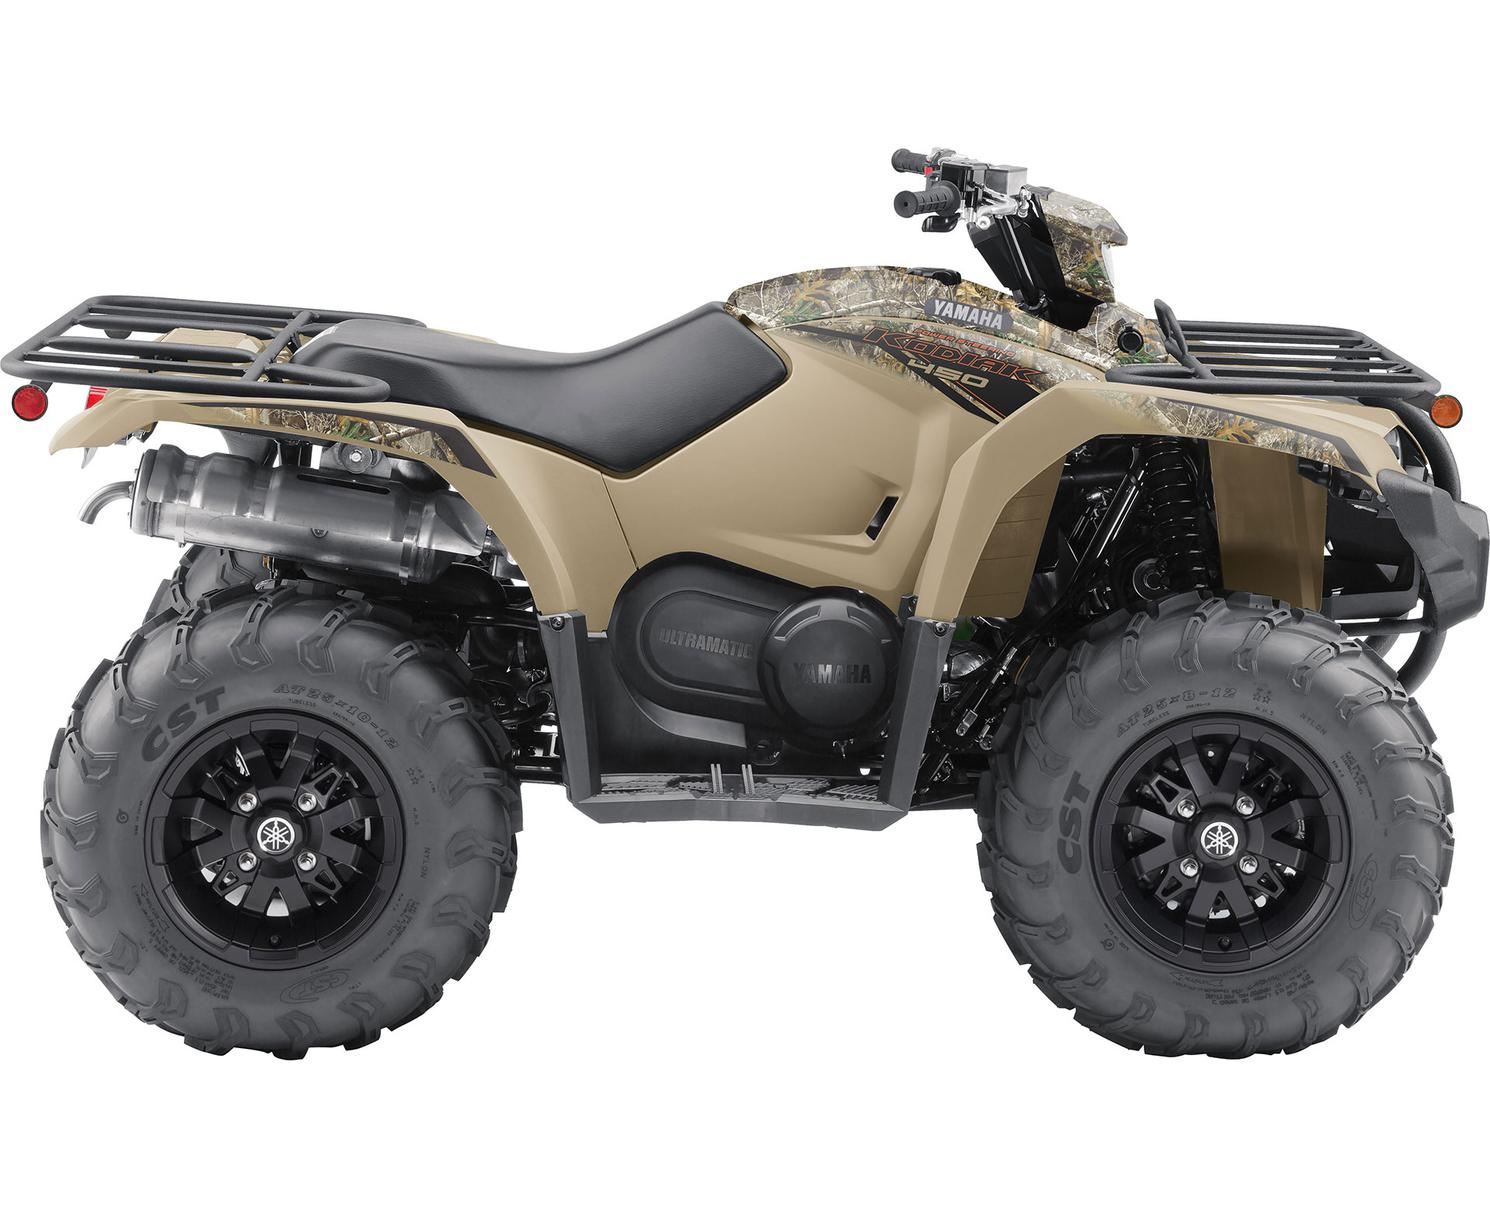 2021 Yamaha Kodiak 450 EPS Fall Beige With Realtree Edge